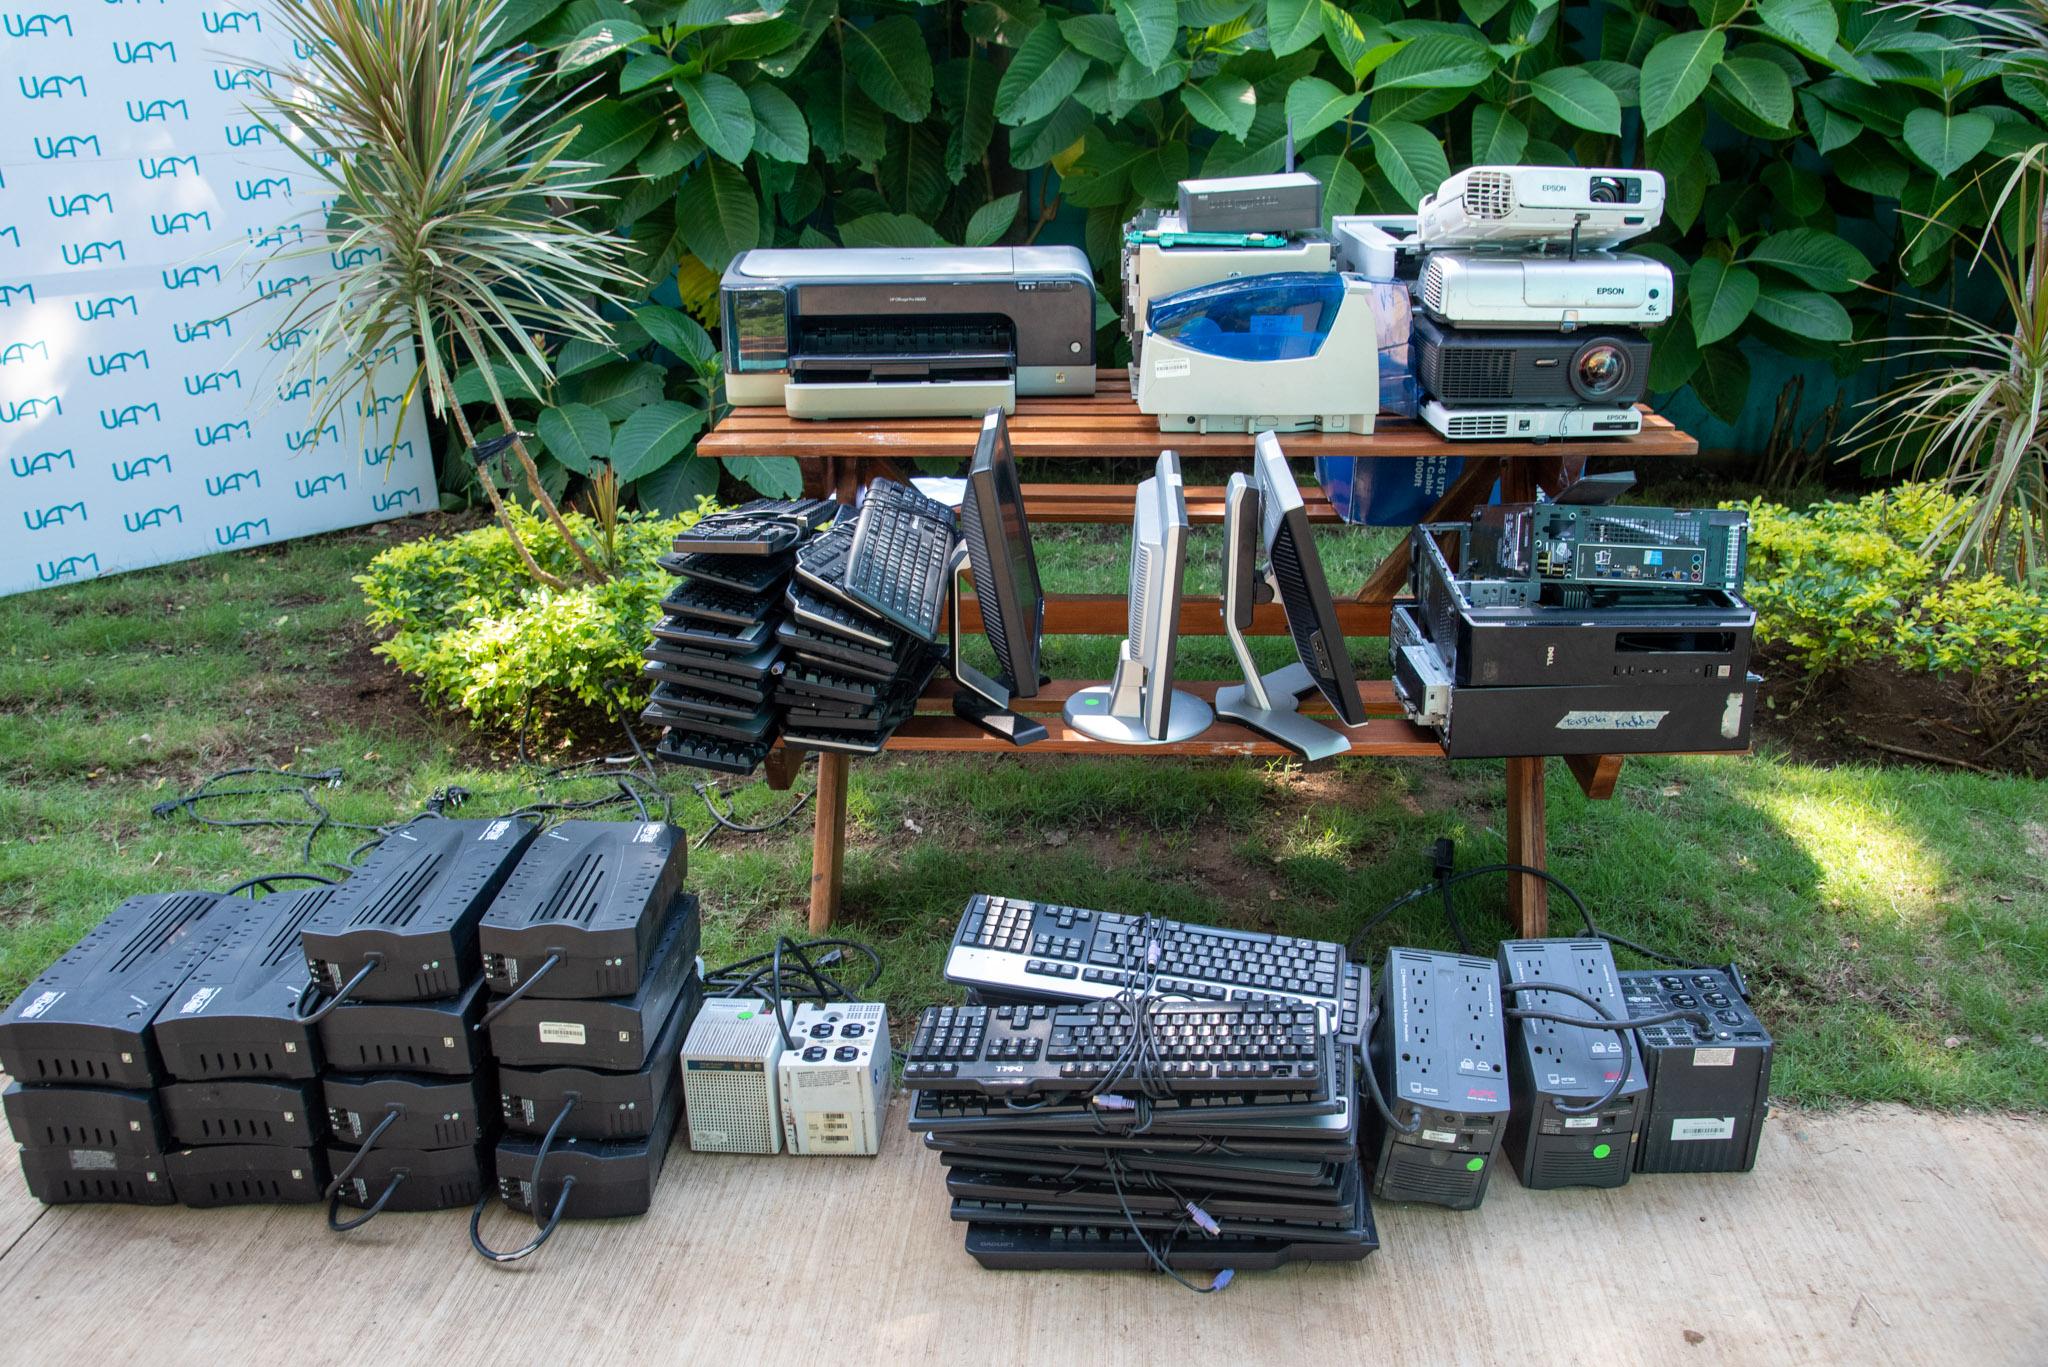 UAM entrega desechos tecnológicos a Claro